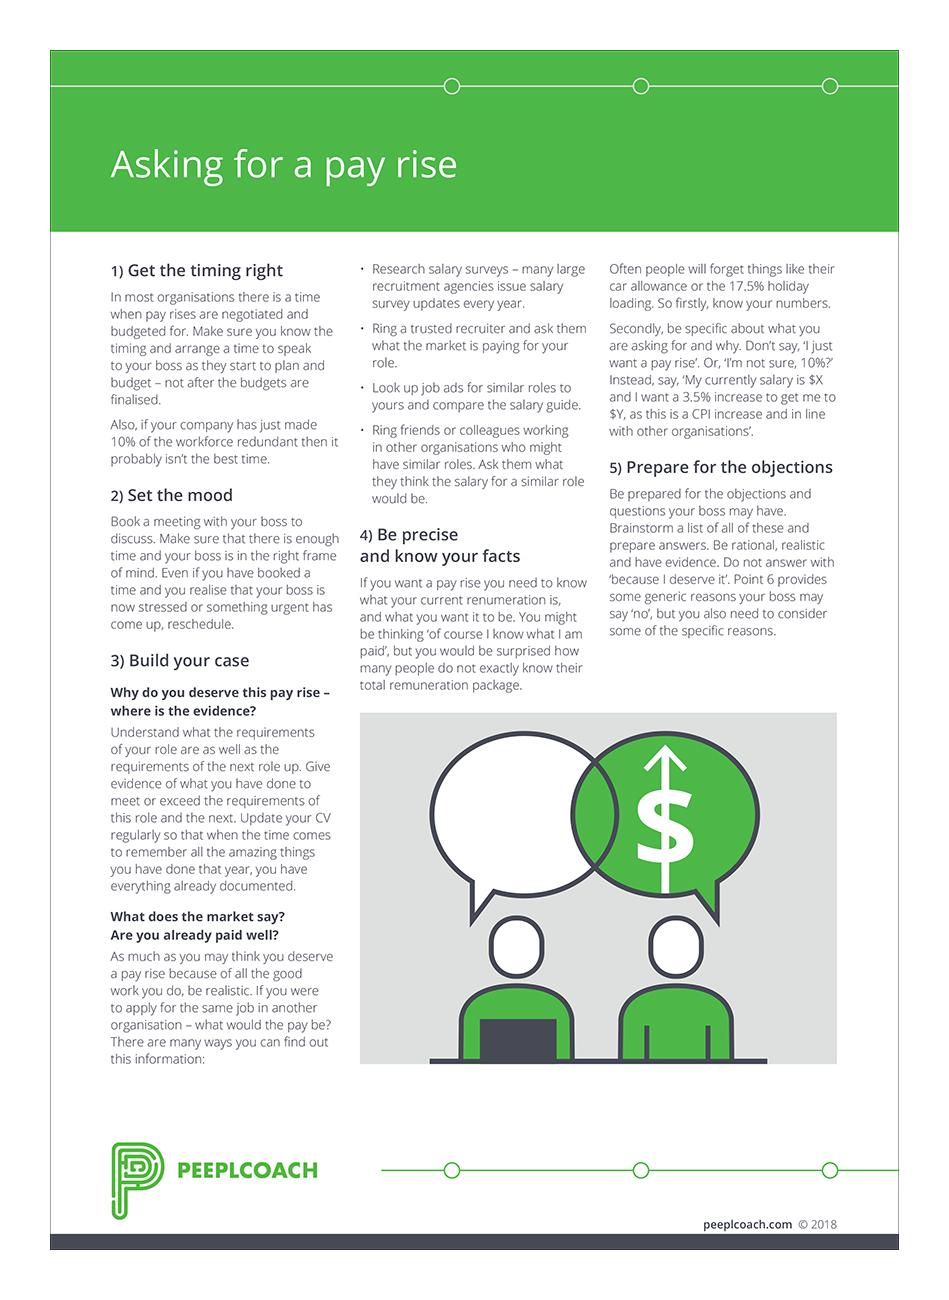 Peeplcoach-information-sheets-graphic-design-4.jpg